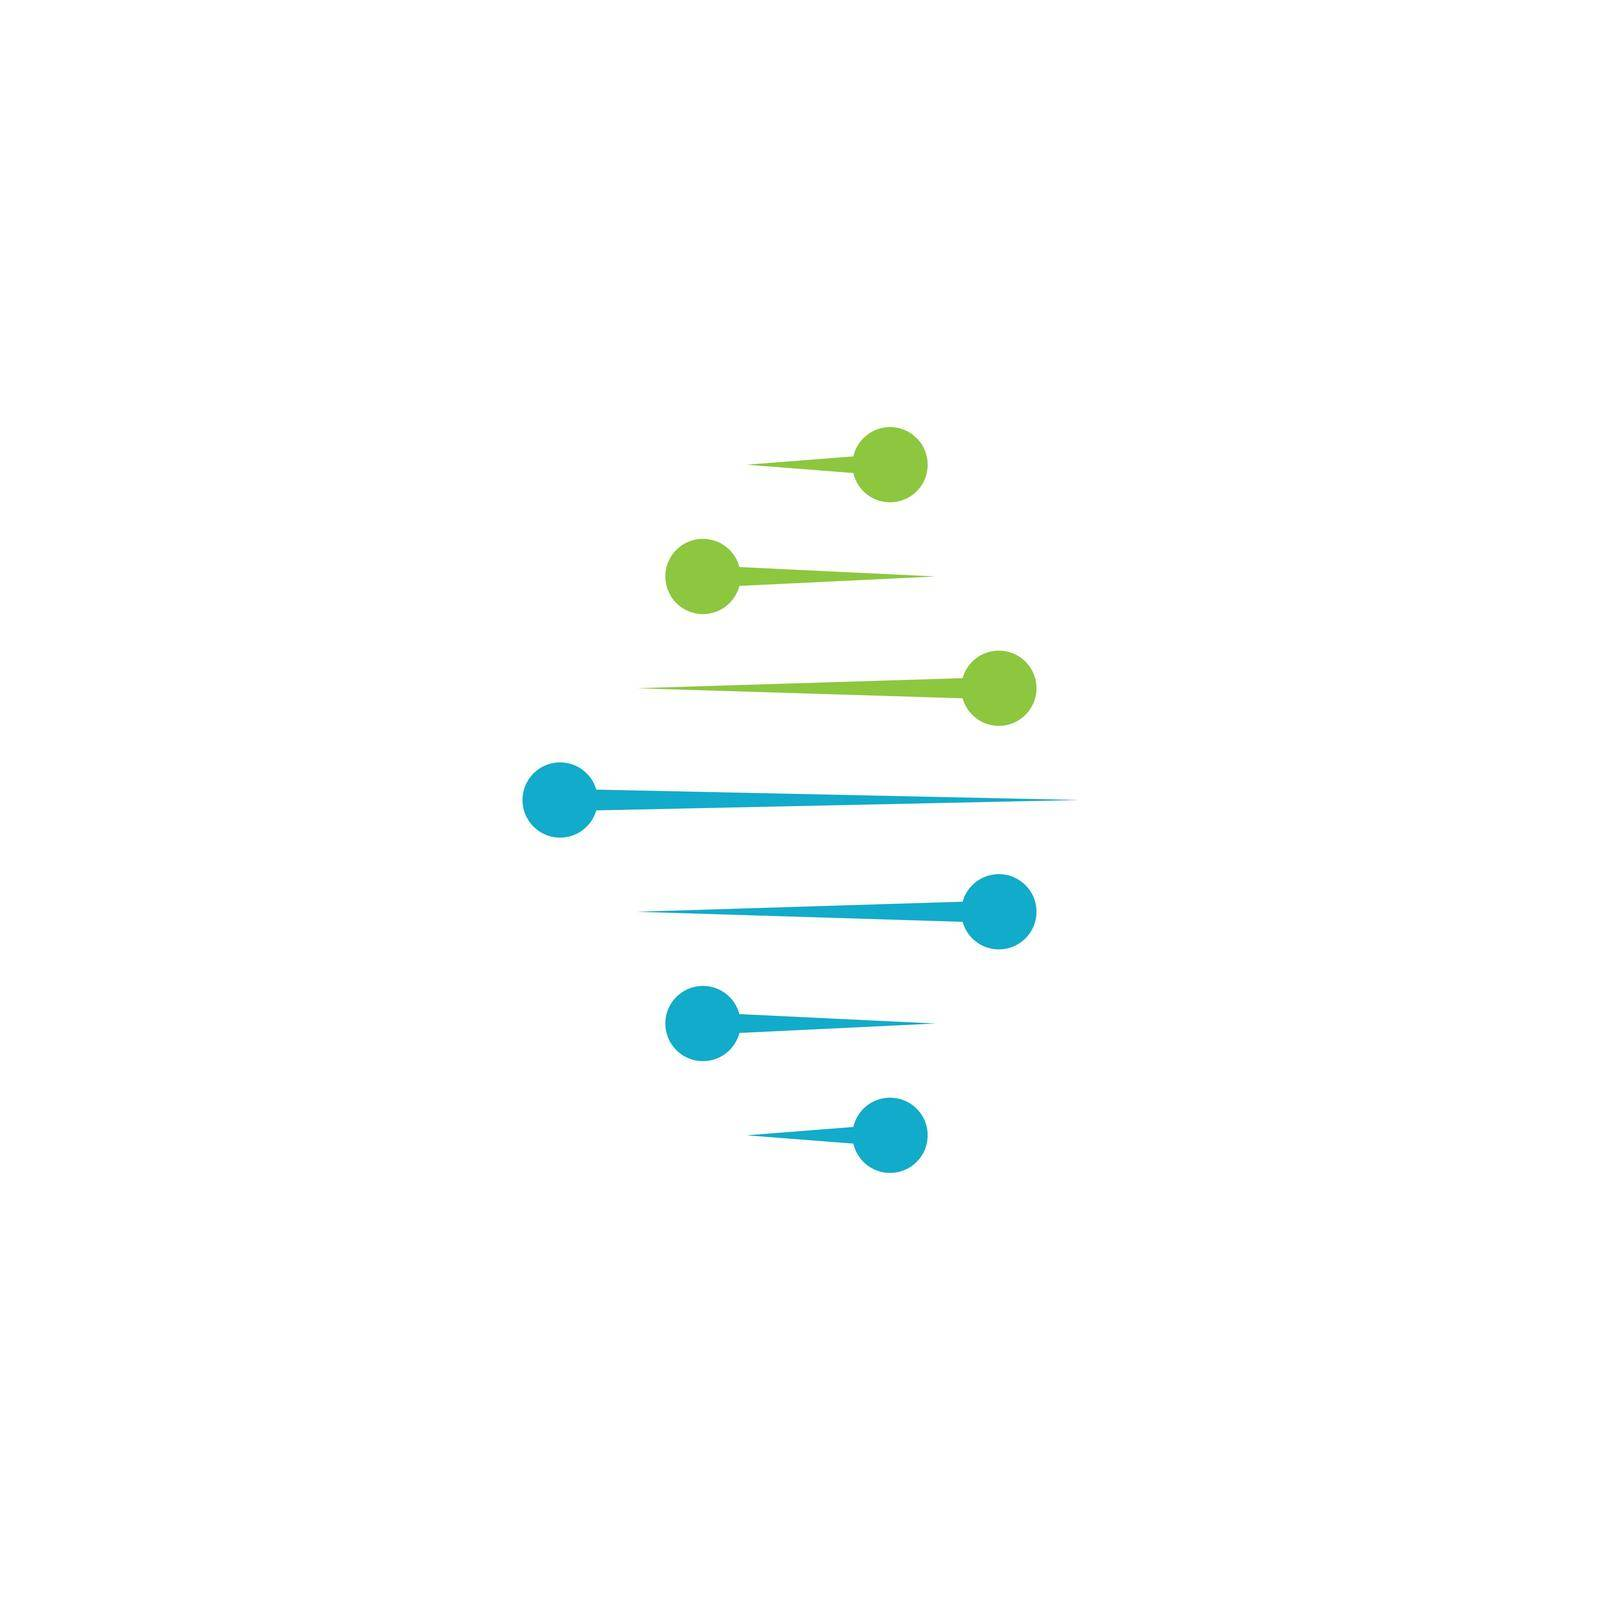 DNA illustration logo vector design